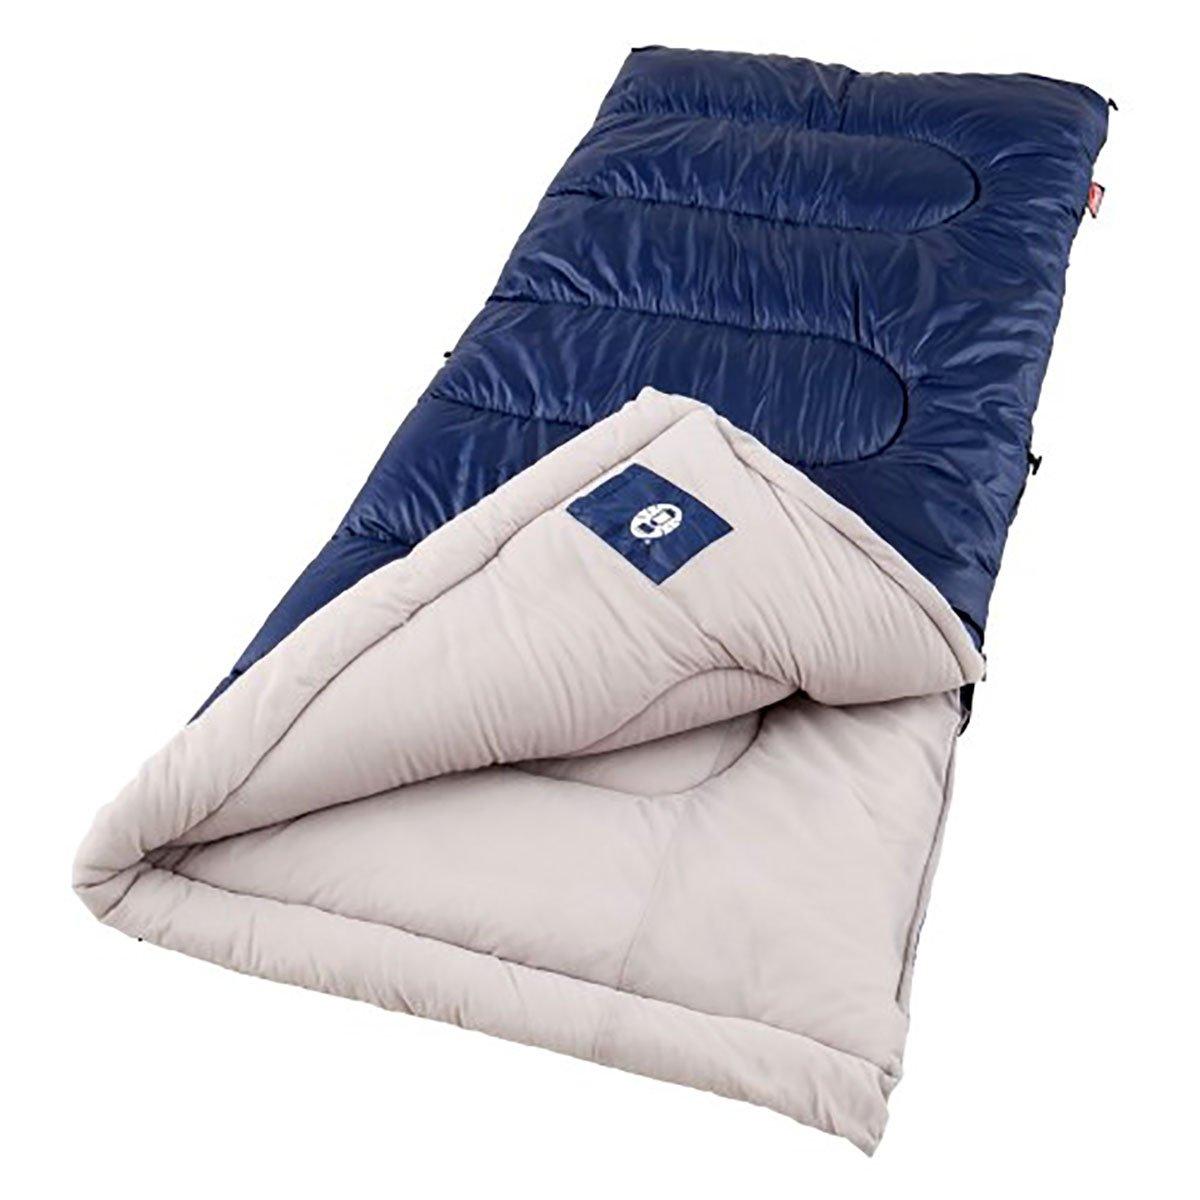 An image related to Coleman Sunridge Polyester Sleeping Bag